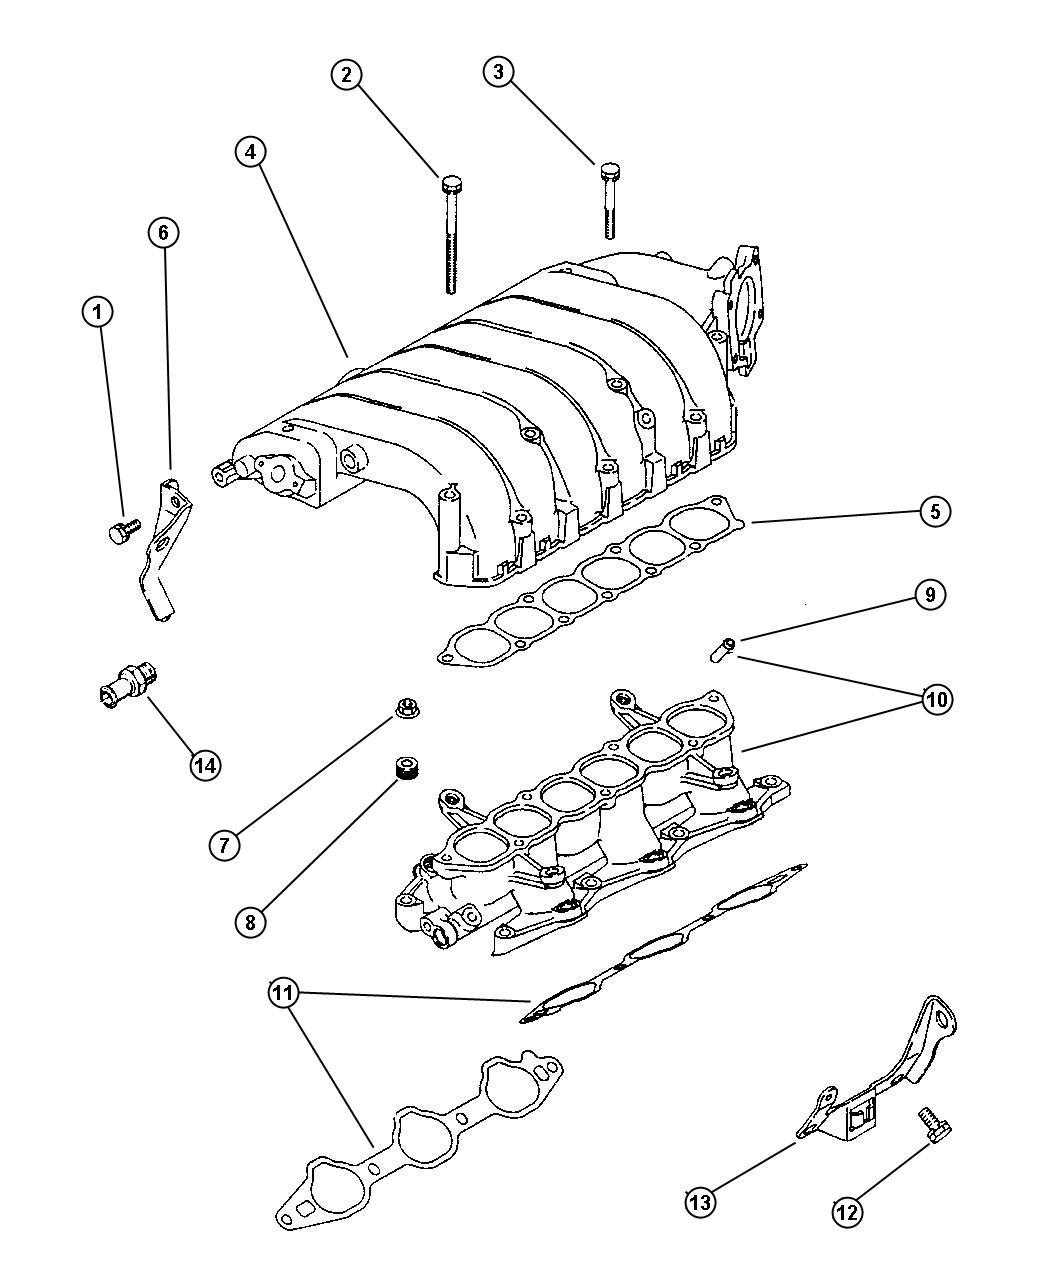 1996 chrysler cirrus engine diagram